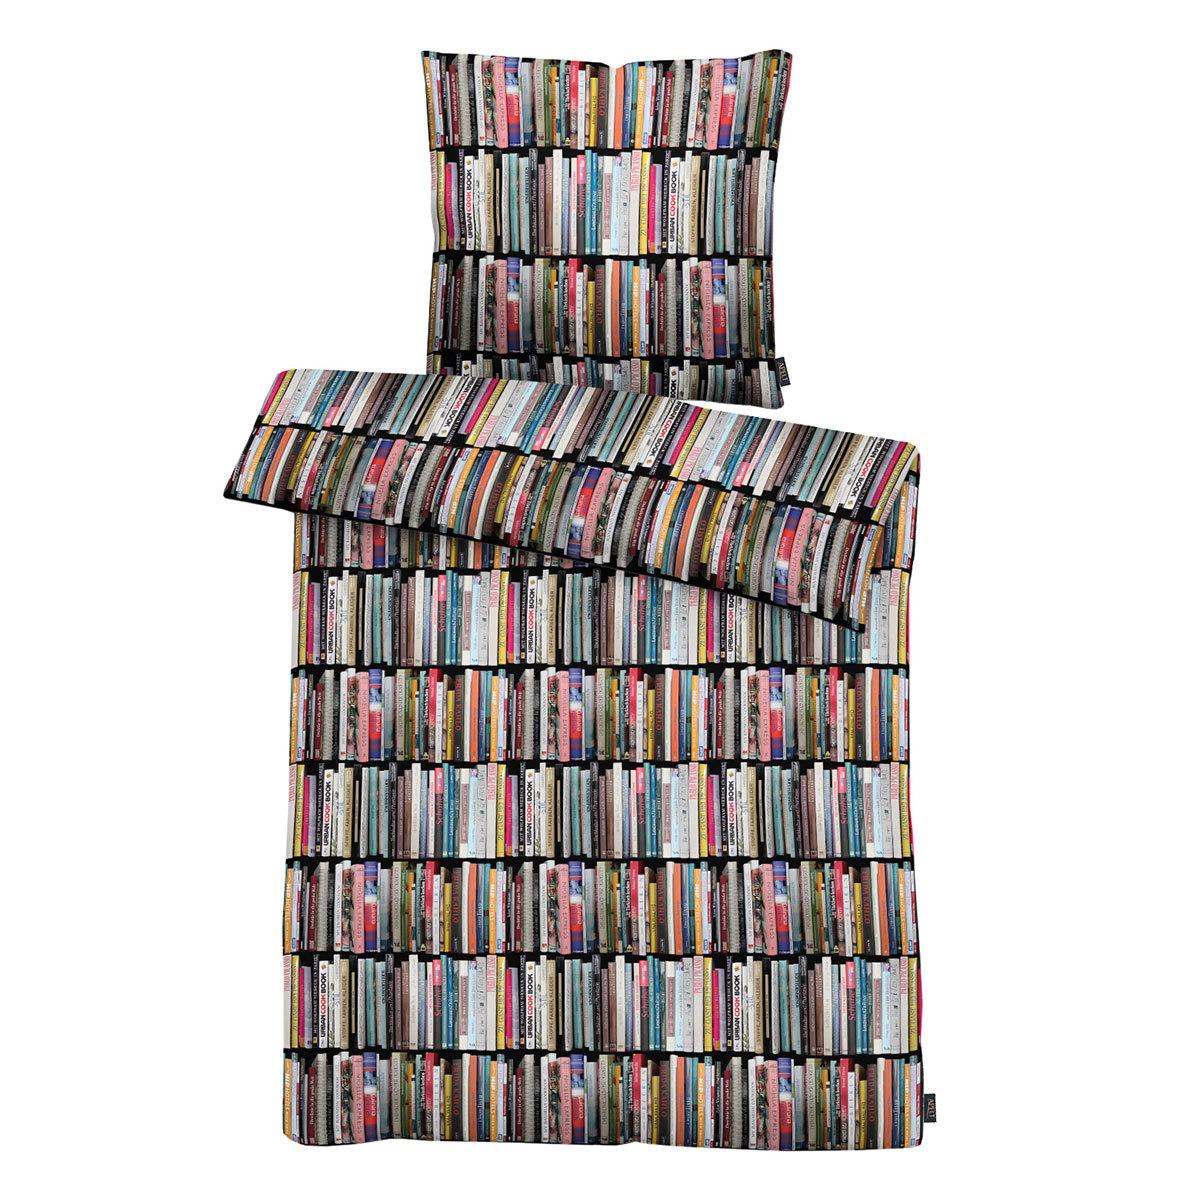 apelt mako satin bettw sche ben g nstig online kaufen bei bettwaren shop. Black Bedroom Furniture Sets. Home Design Ideas